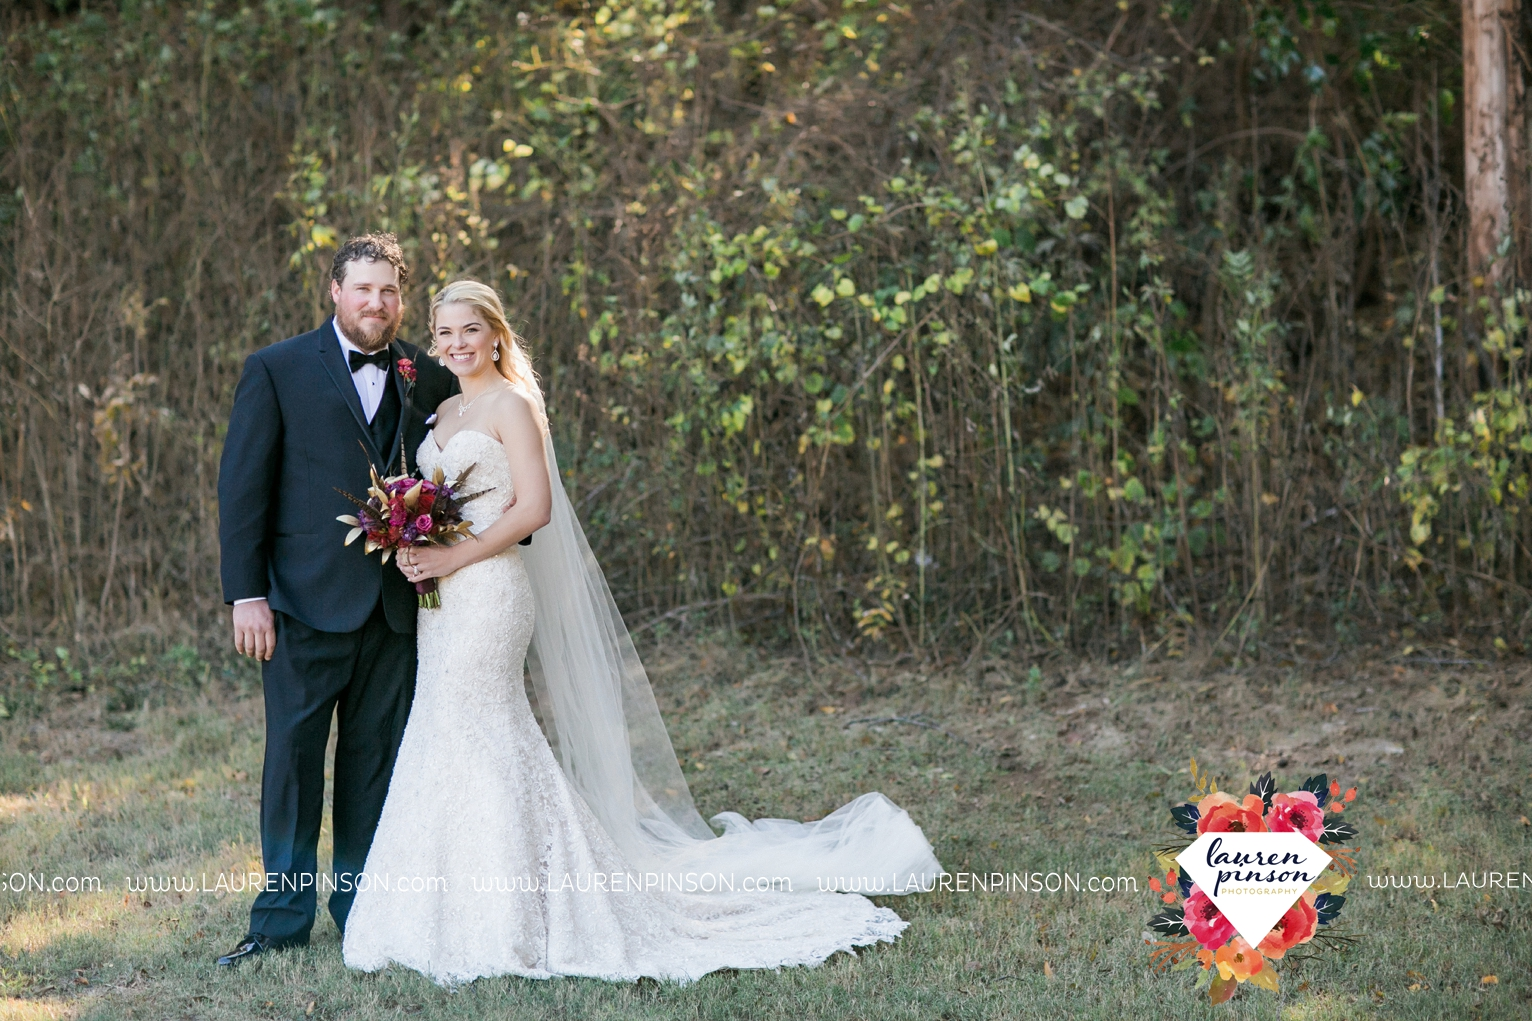 rustic-wichita-falls-texas-wedding-photographer-gold-glam-mayfield-events-market-street-united-allue-bridals-fall_1673.jpg